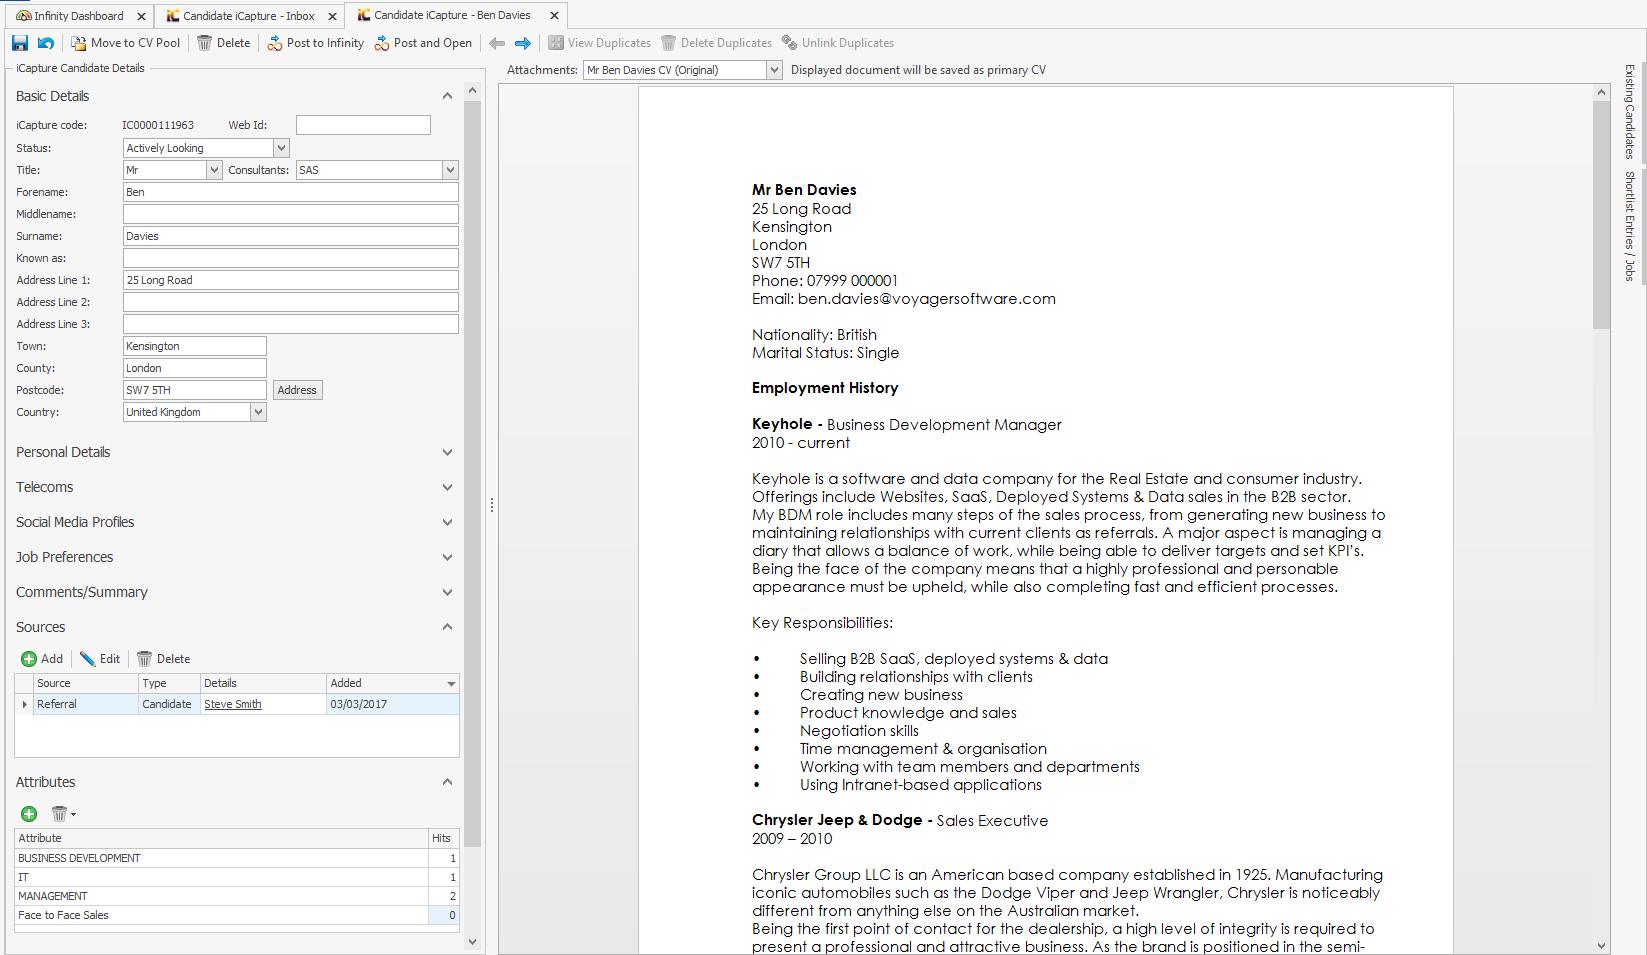 Resume entry